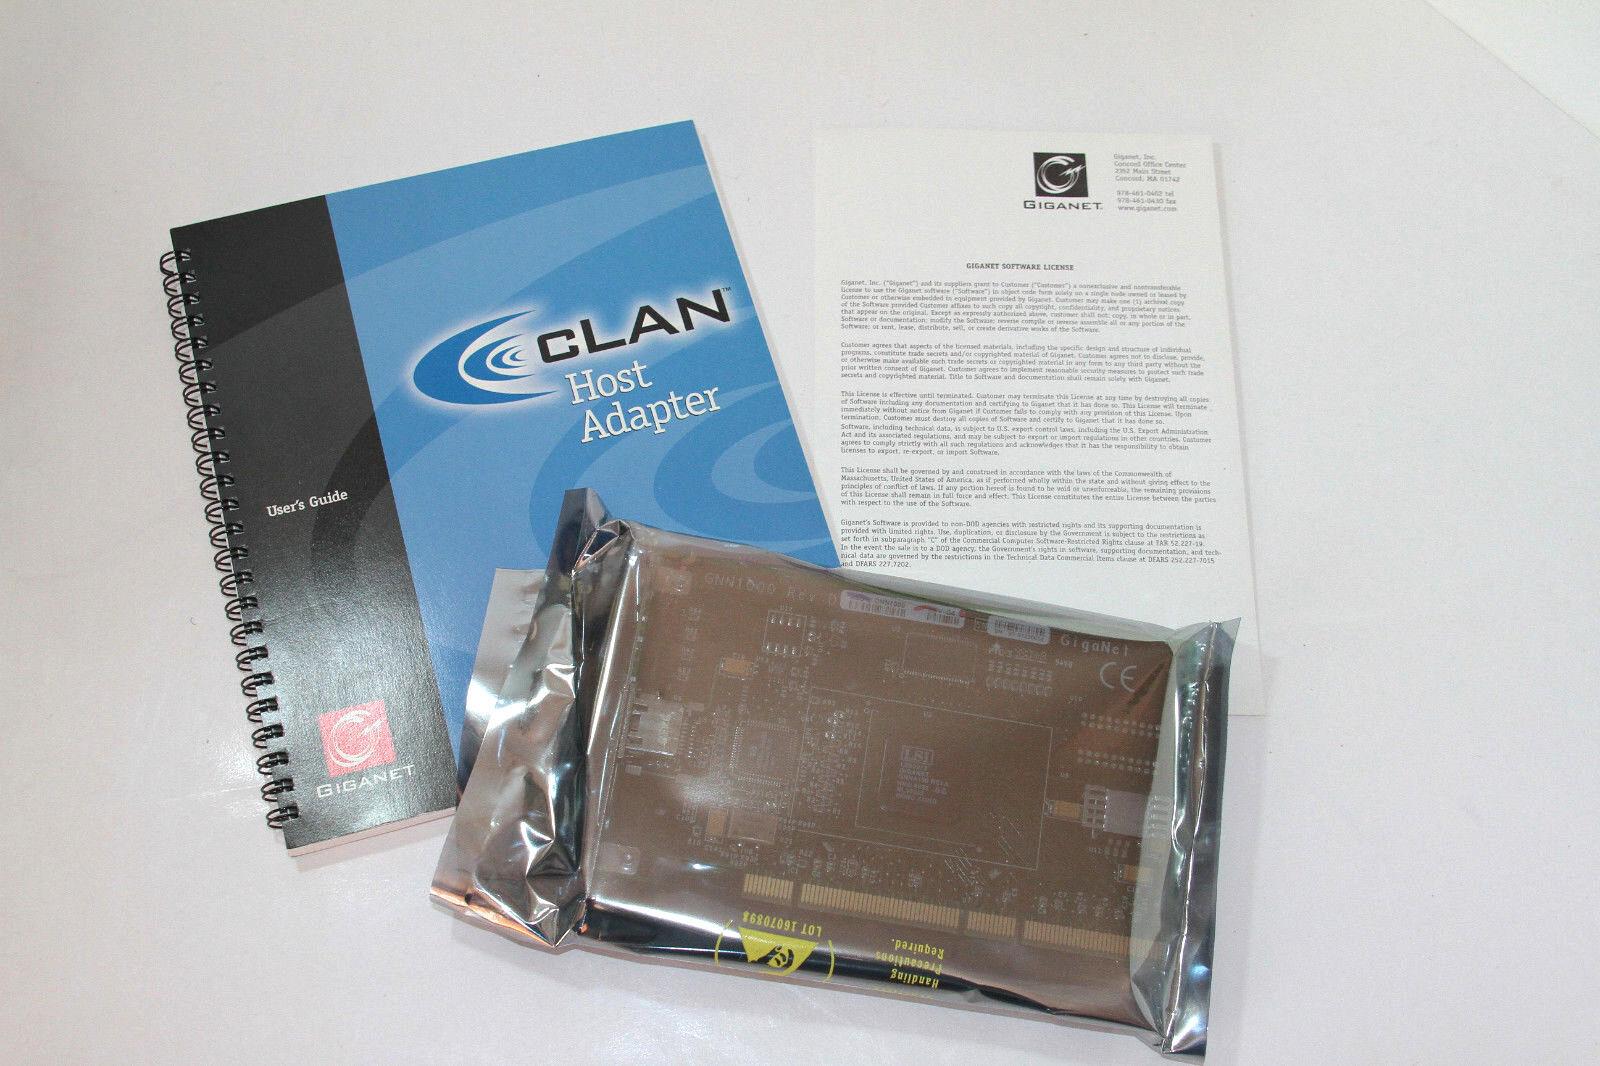 Giganet cLAN Host Adapter GNN1000 Rev D New In Box NNG 9832